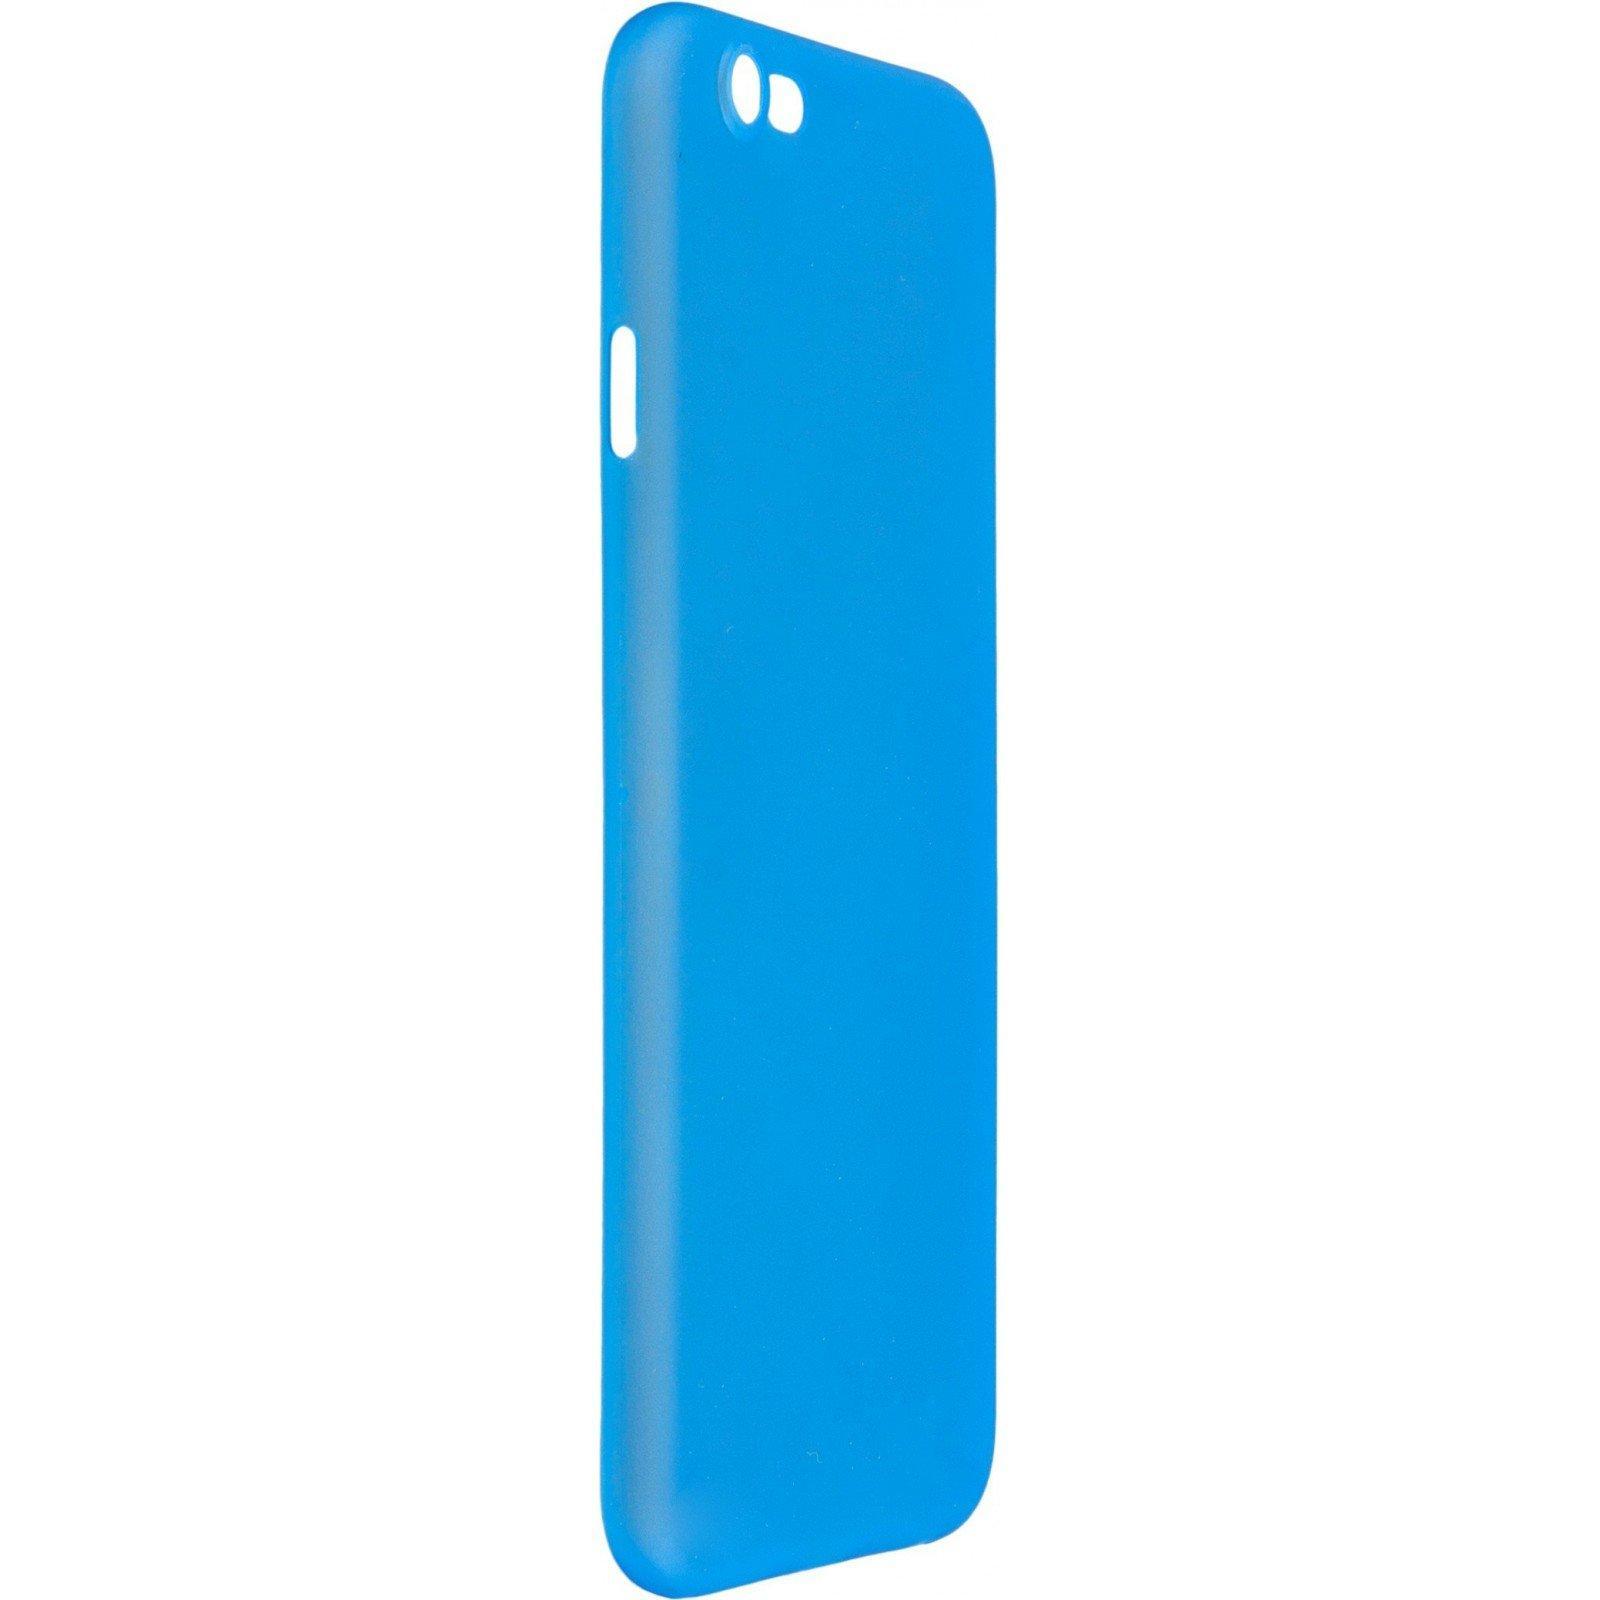 Чехол для моб. телефона MakeFuture Ice Case (PP) для Apple iPhone 6 Blue (MCI-AI6BL) изображение 3